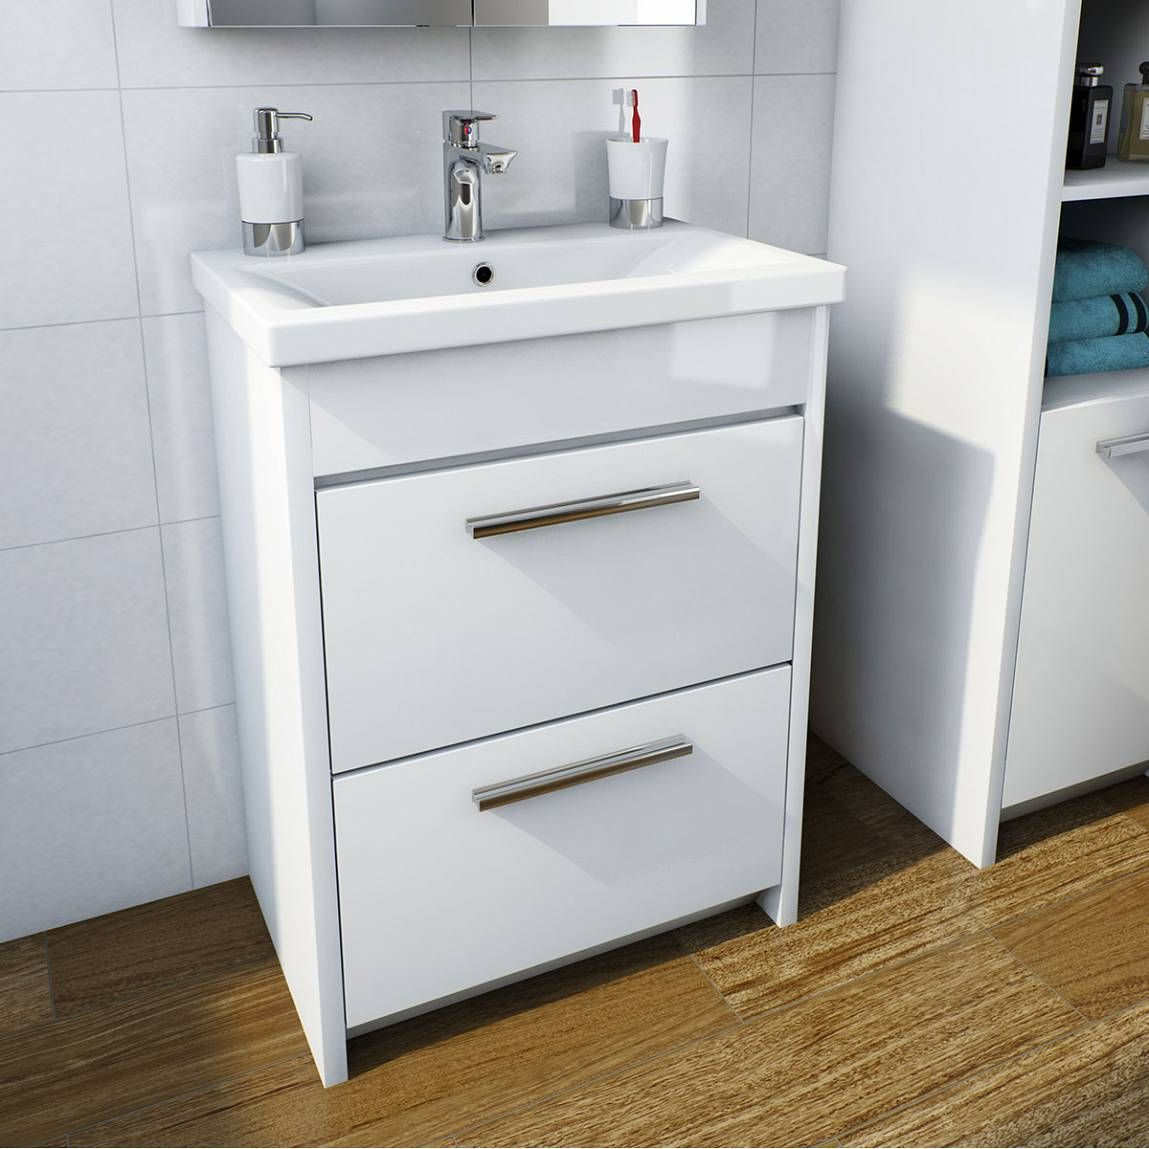 Clarity White Floorstanding Vanity Unit And Ceramic Basin 510mm In